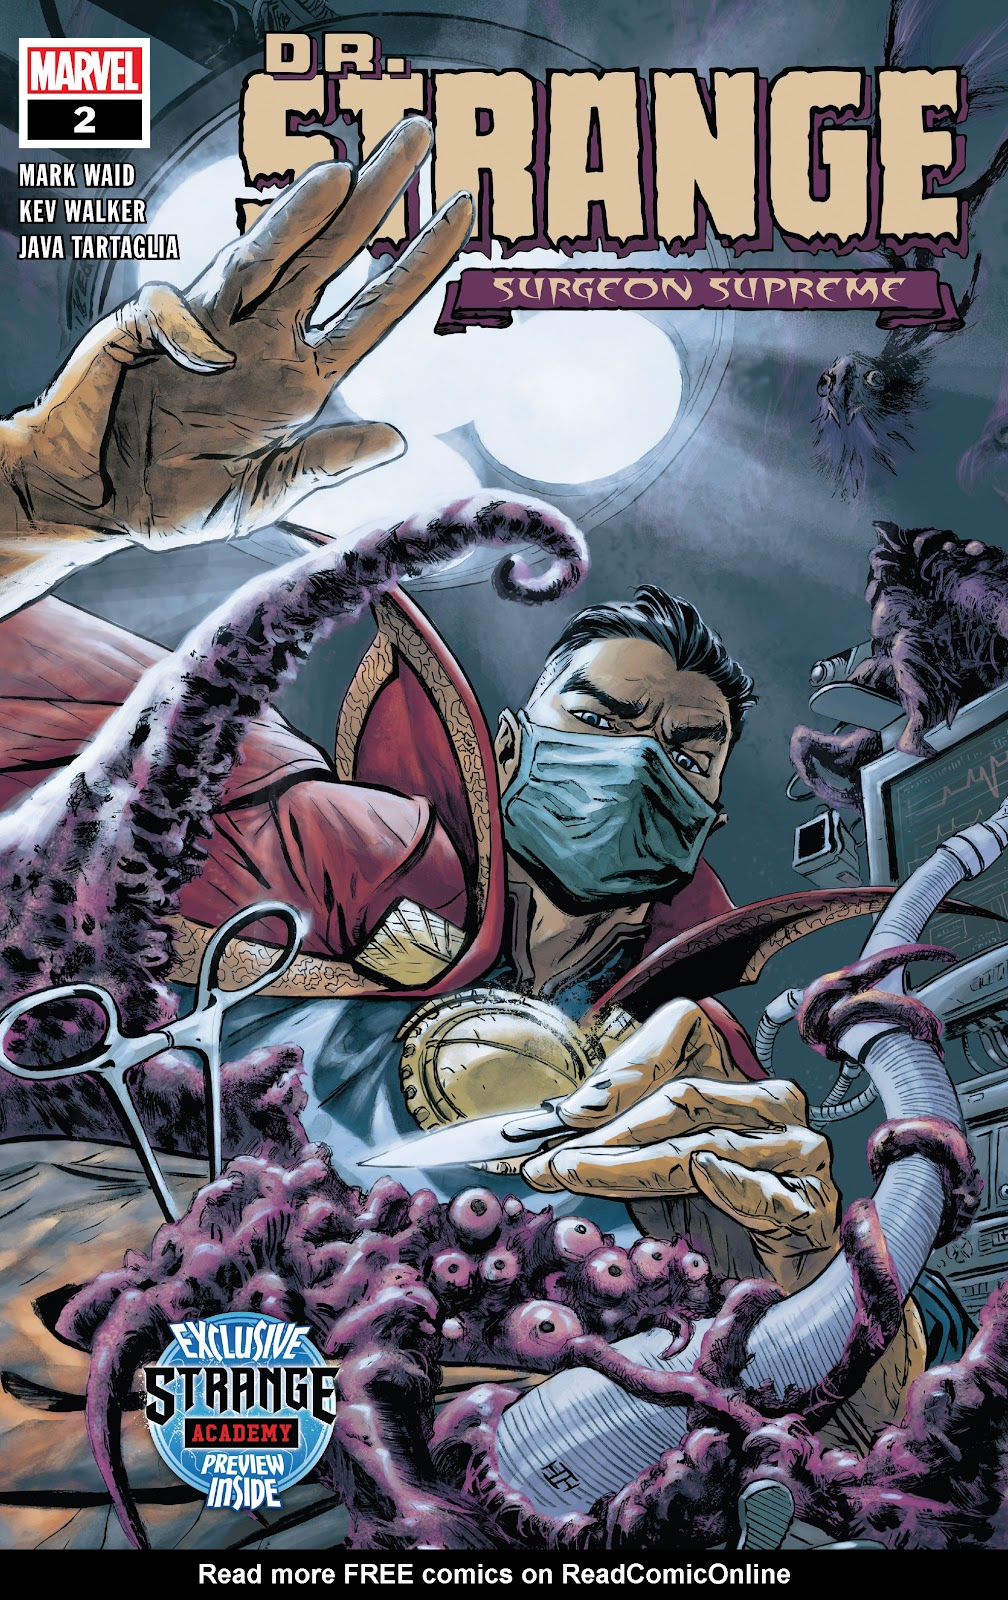 Read online Dr. Strange comic -  Issue #2 - 1